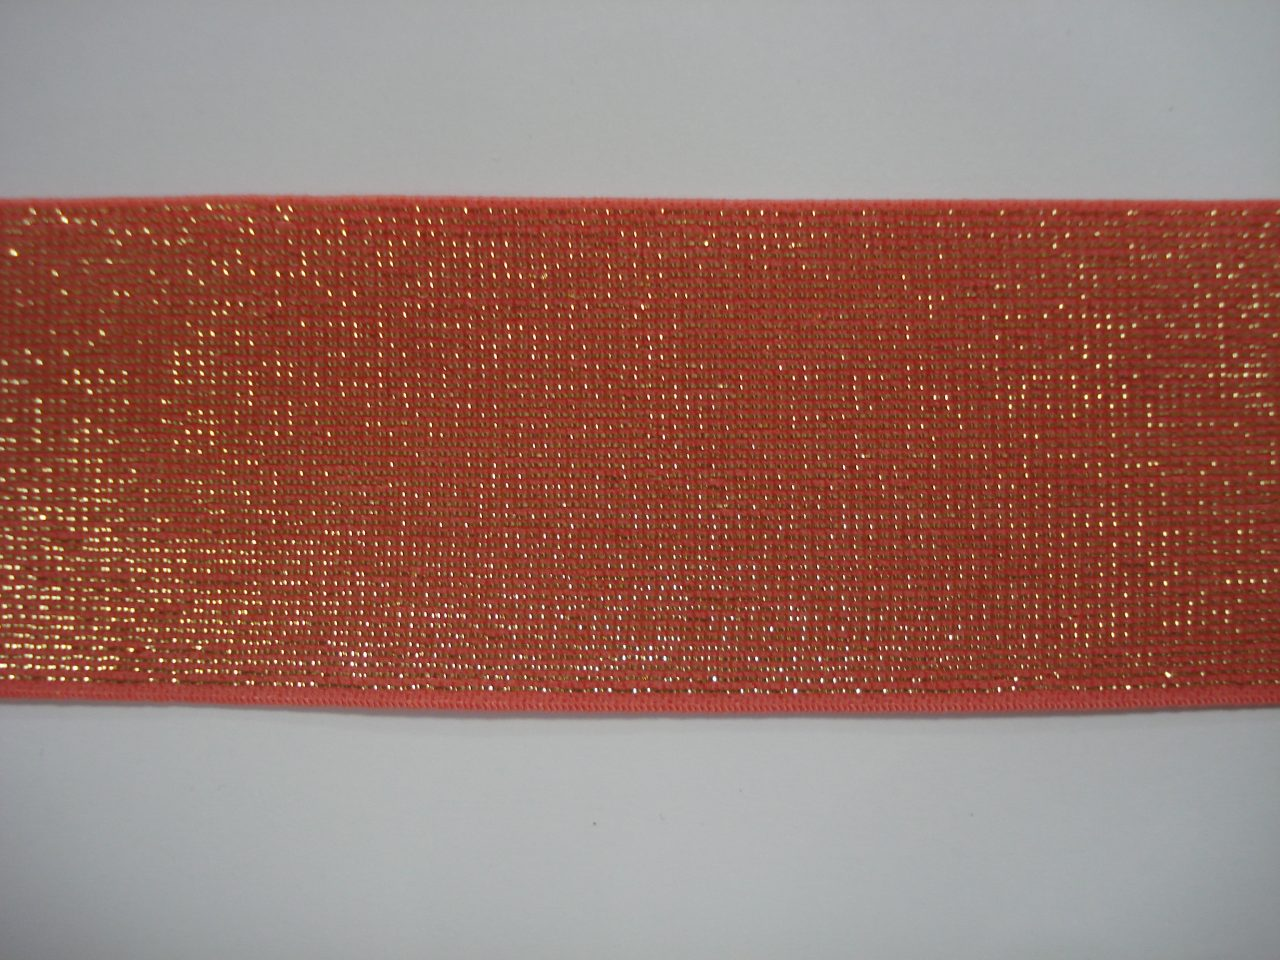 Glitter Elastiek 40mm koraal/goud €3,50 p/m